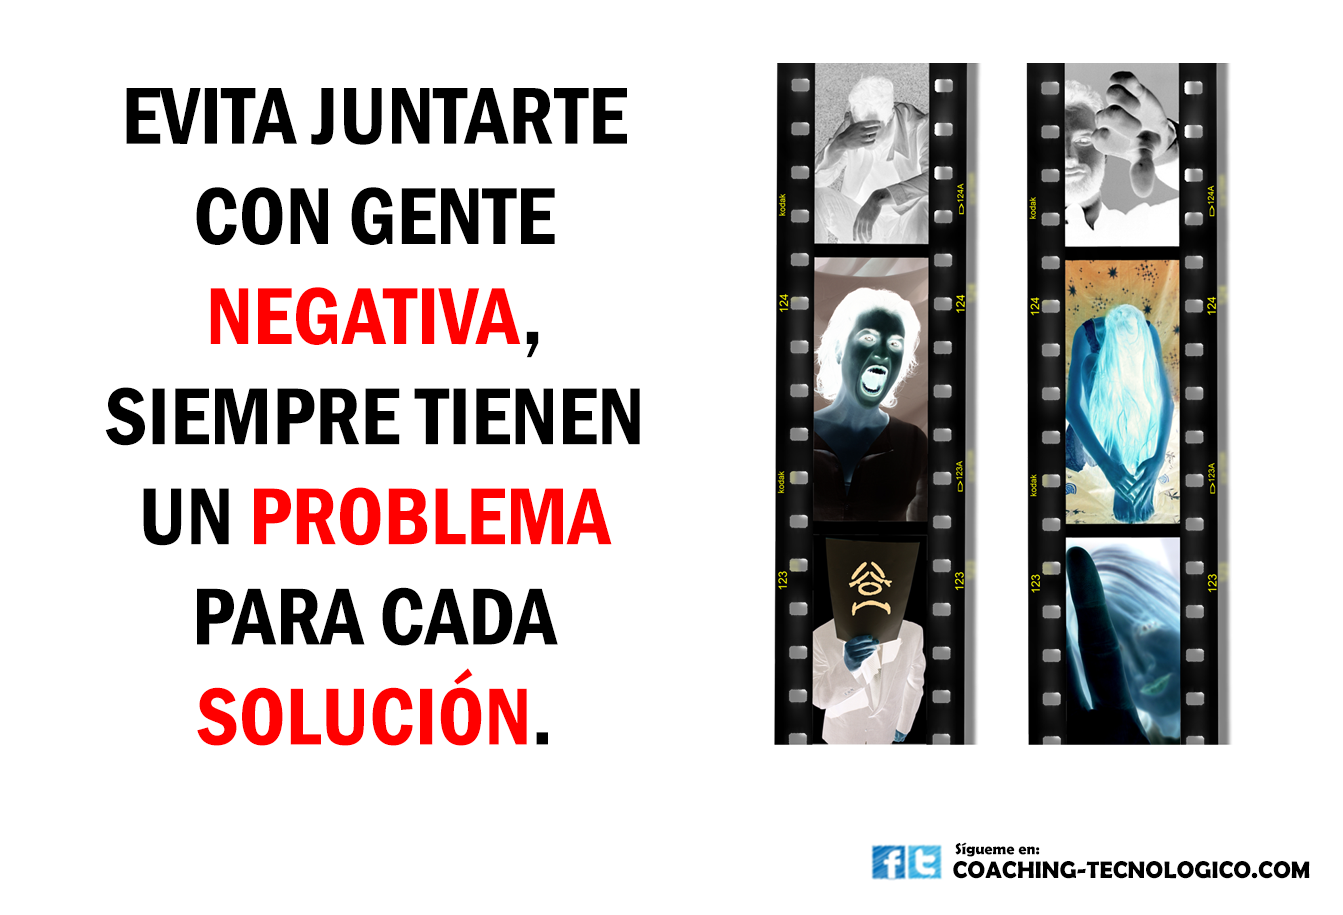 evita_juntarte_con_gente_negativa